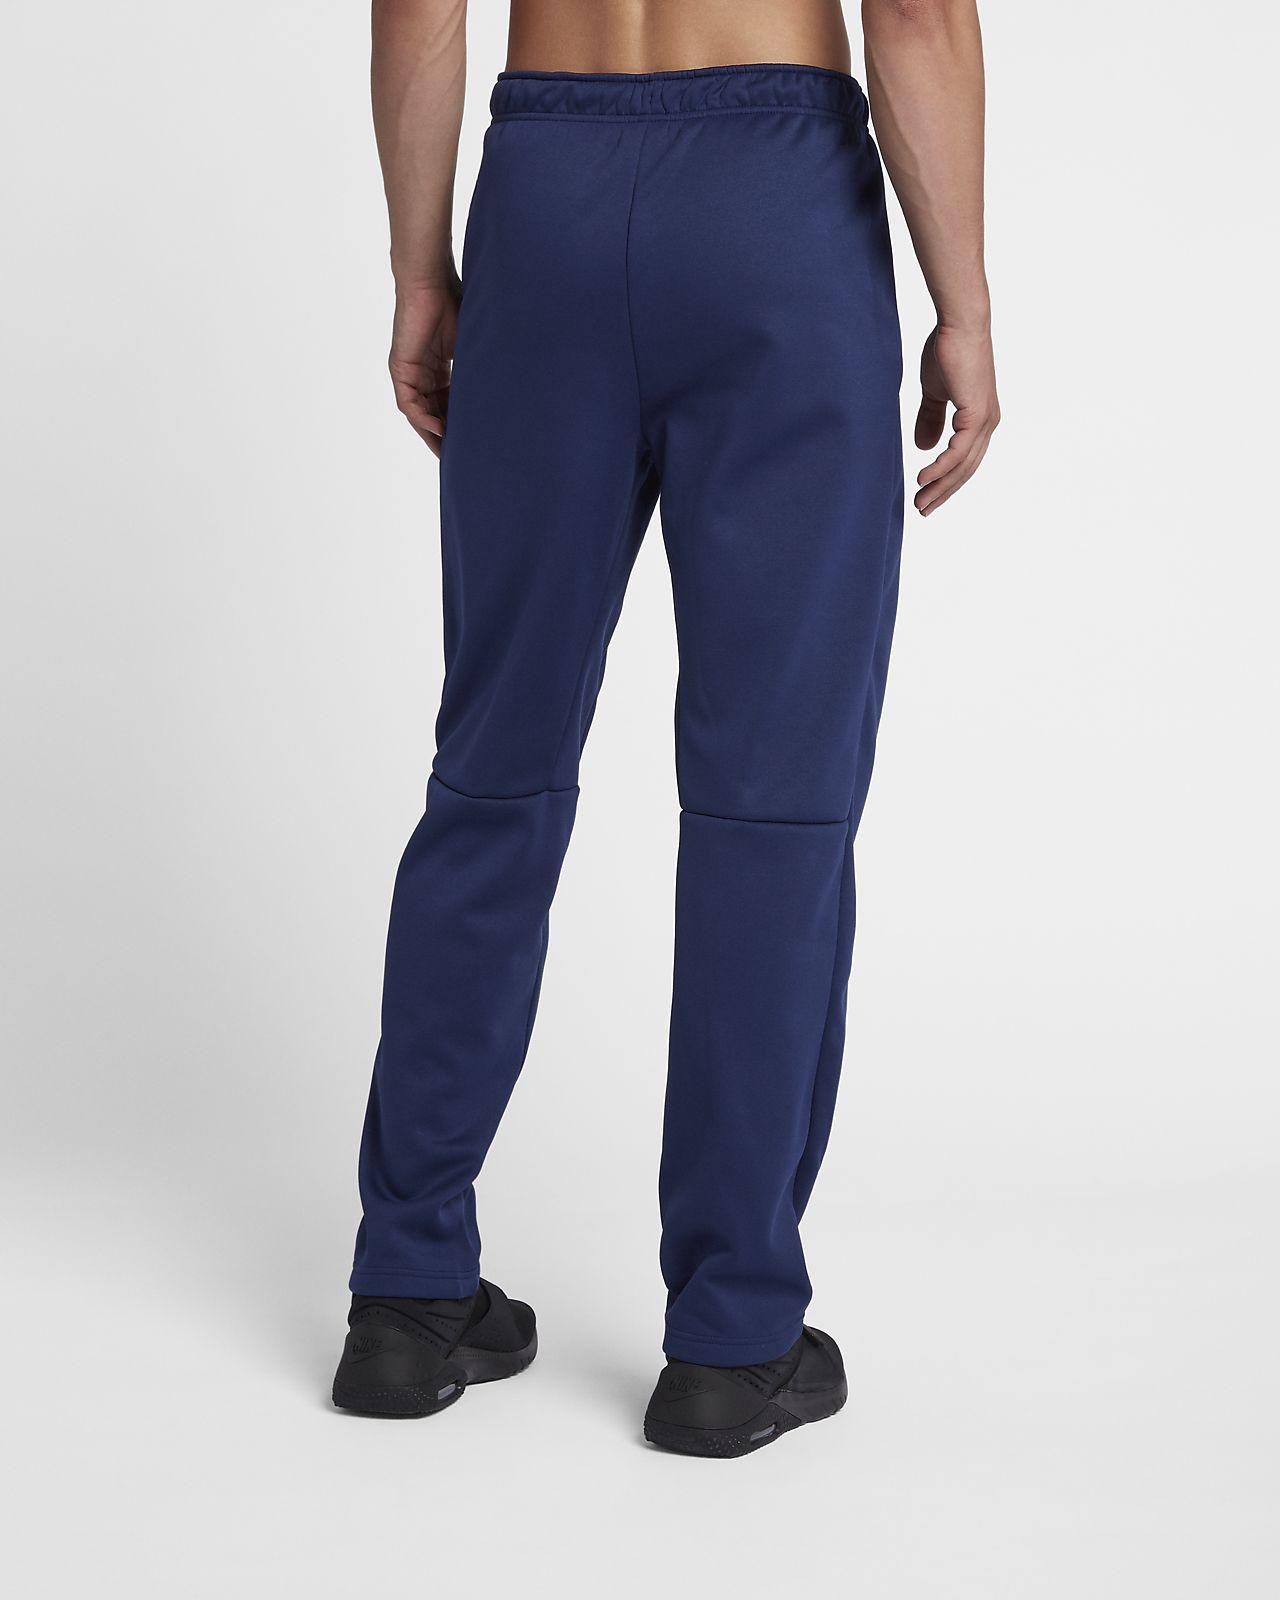 Nike Dri FIT Therma Men's Training Pants